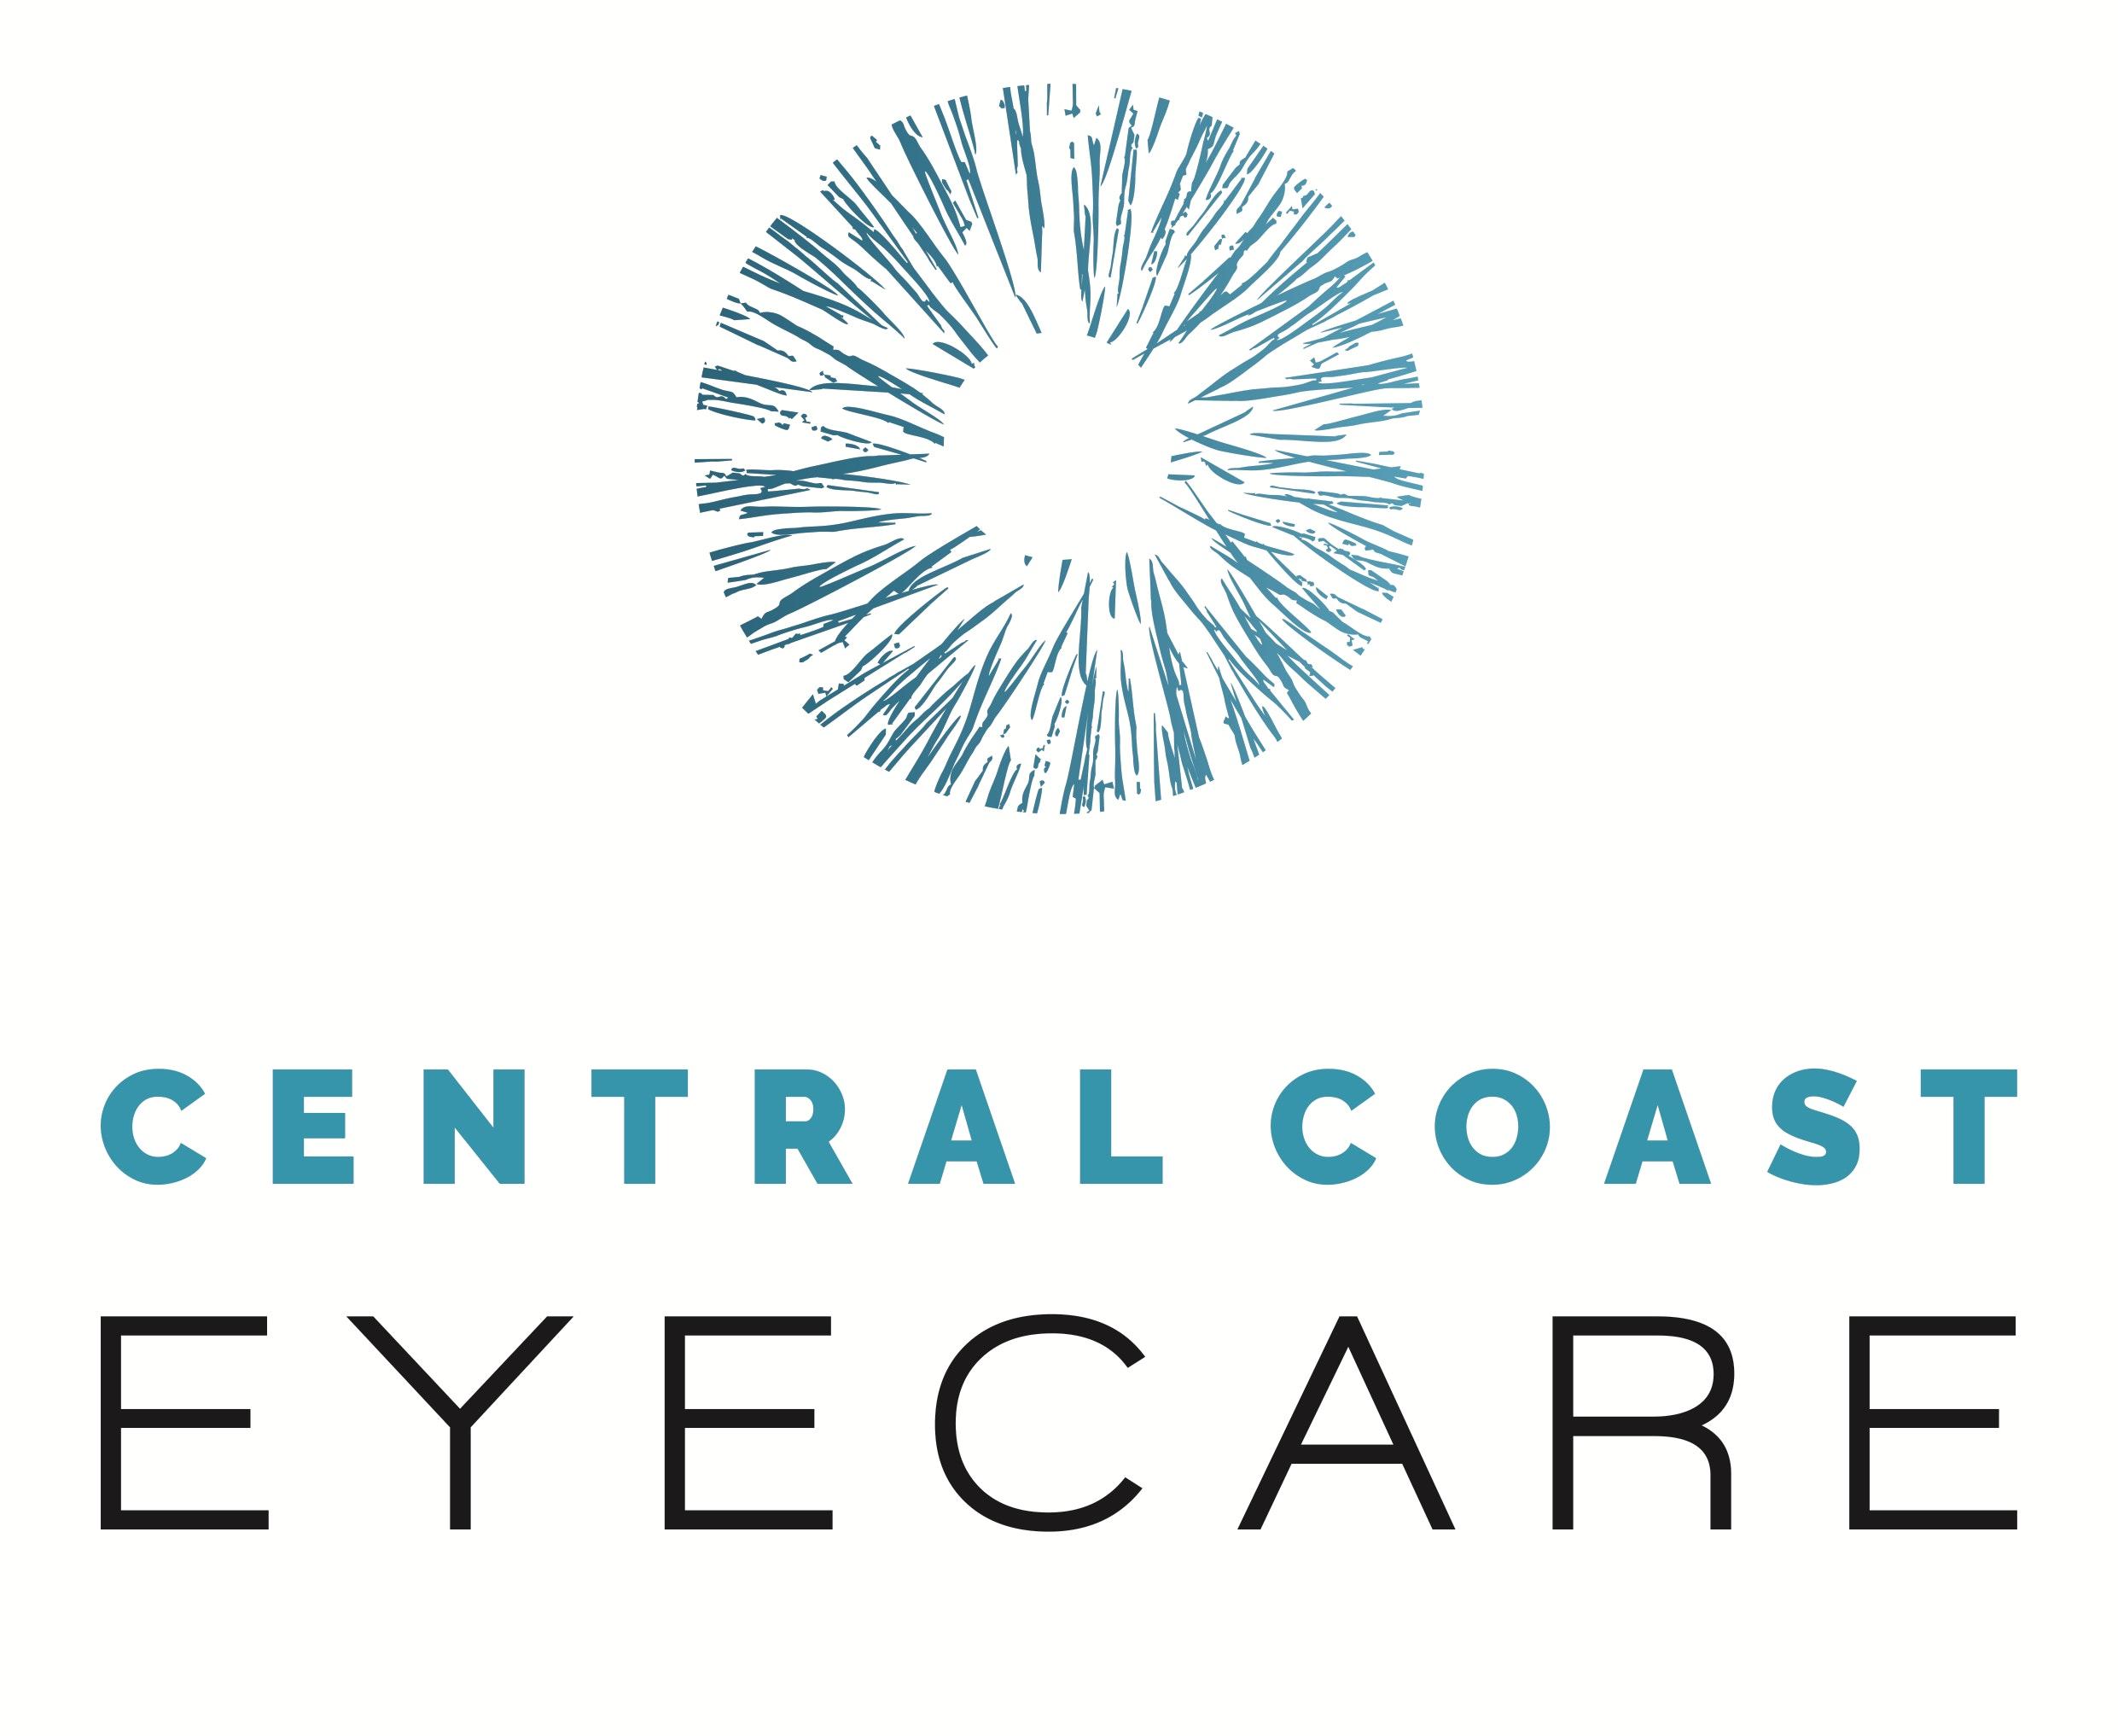 Central Coast Eyecare - Killarney Vale